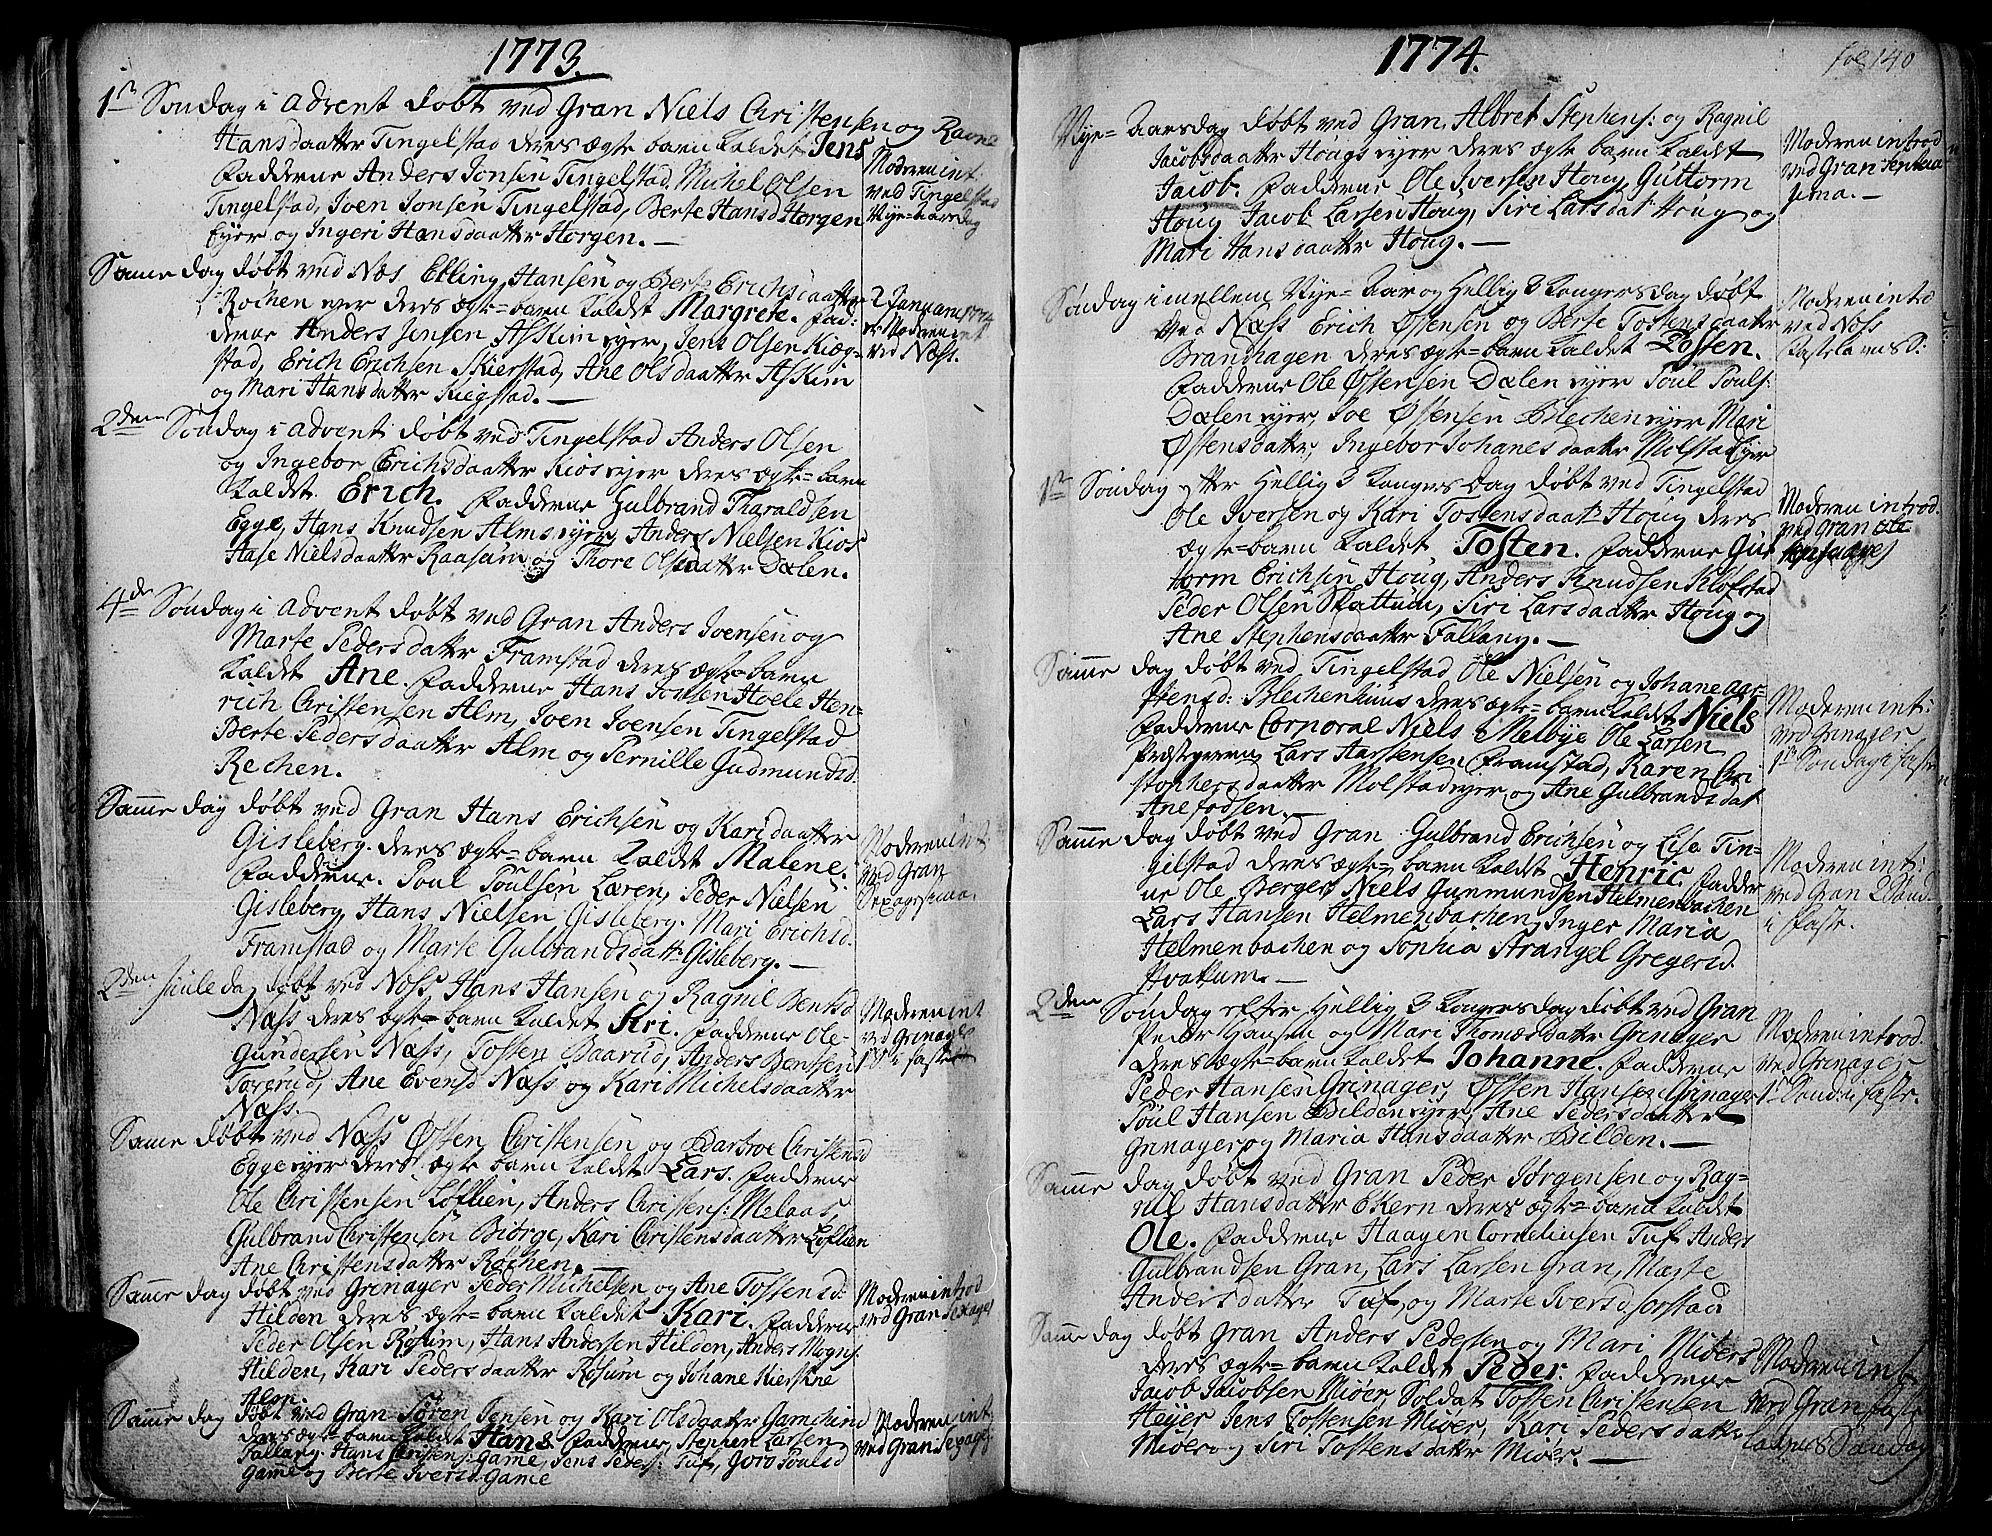 SAH, Gran prestekontor, Ministerialbok nr. 4, 1759-1775, s. 140